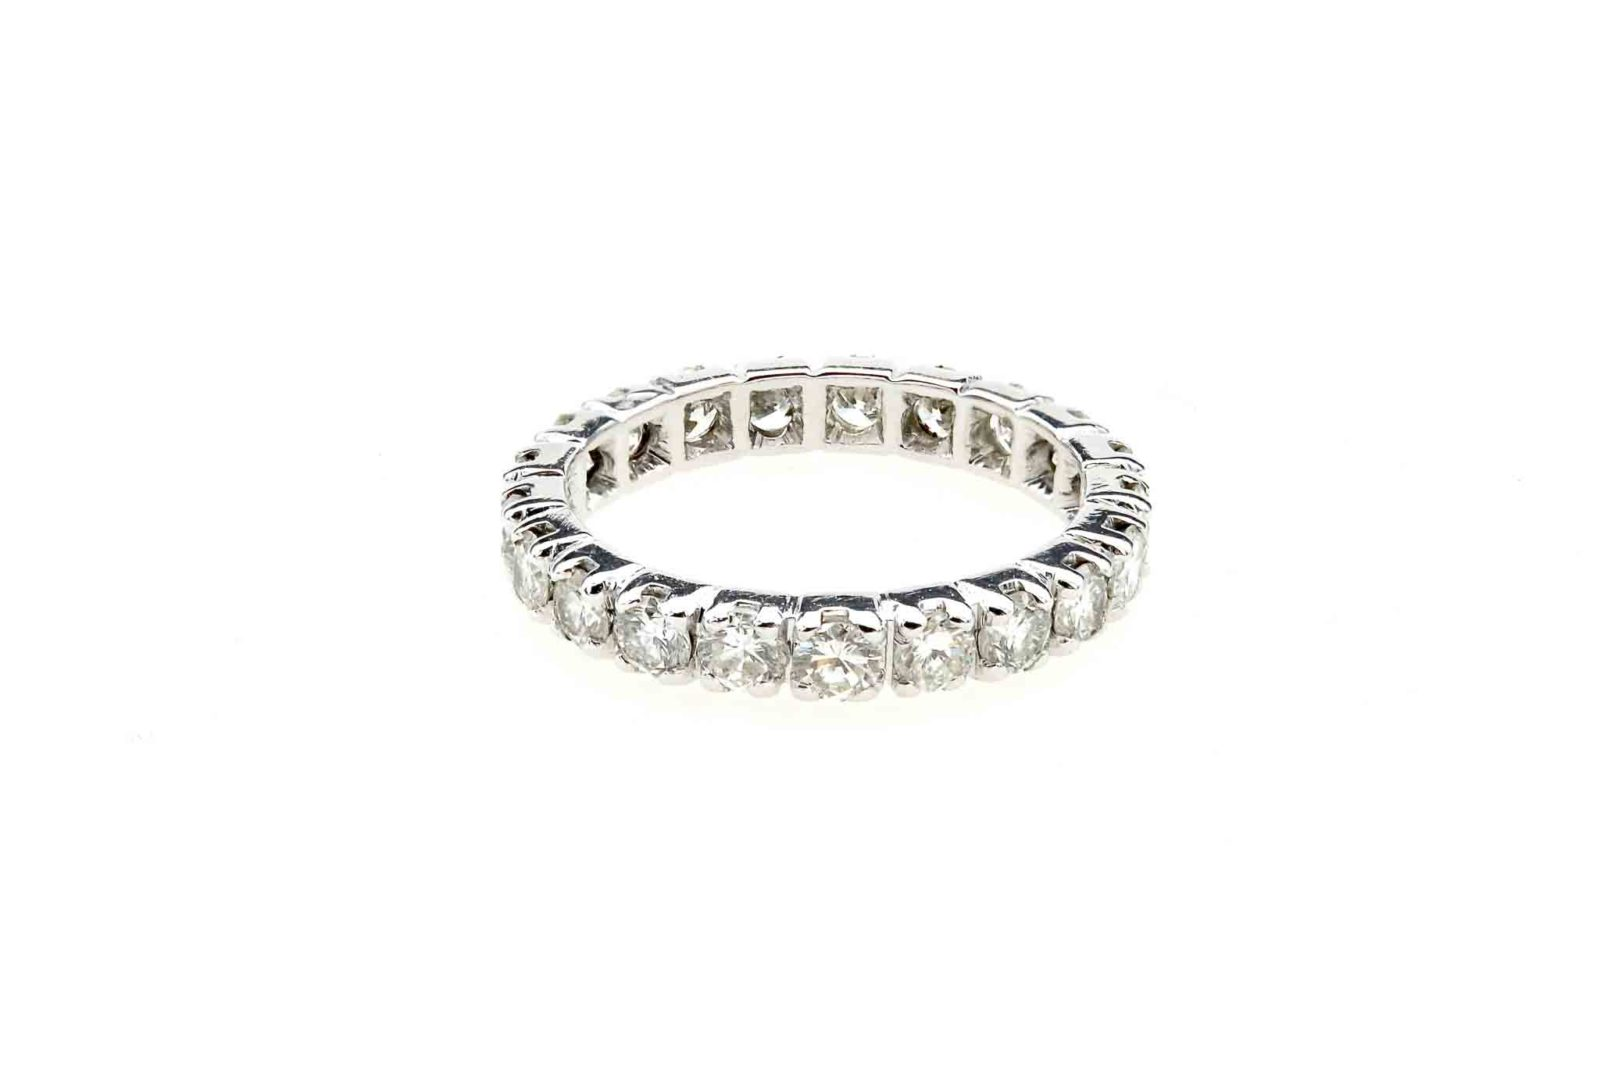 Alliance diamants en or blanc 18k